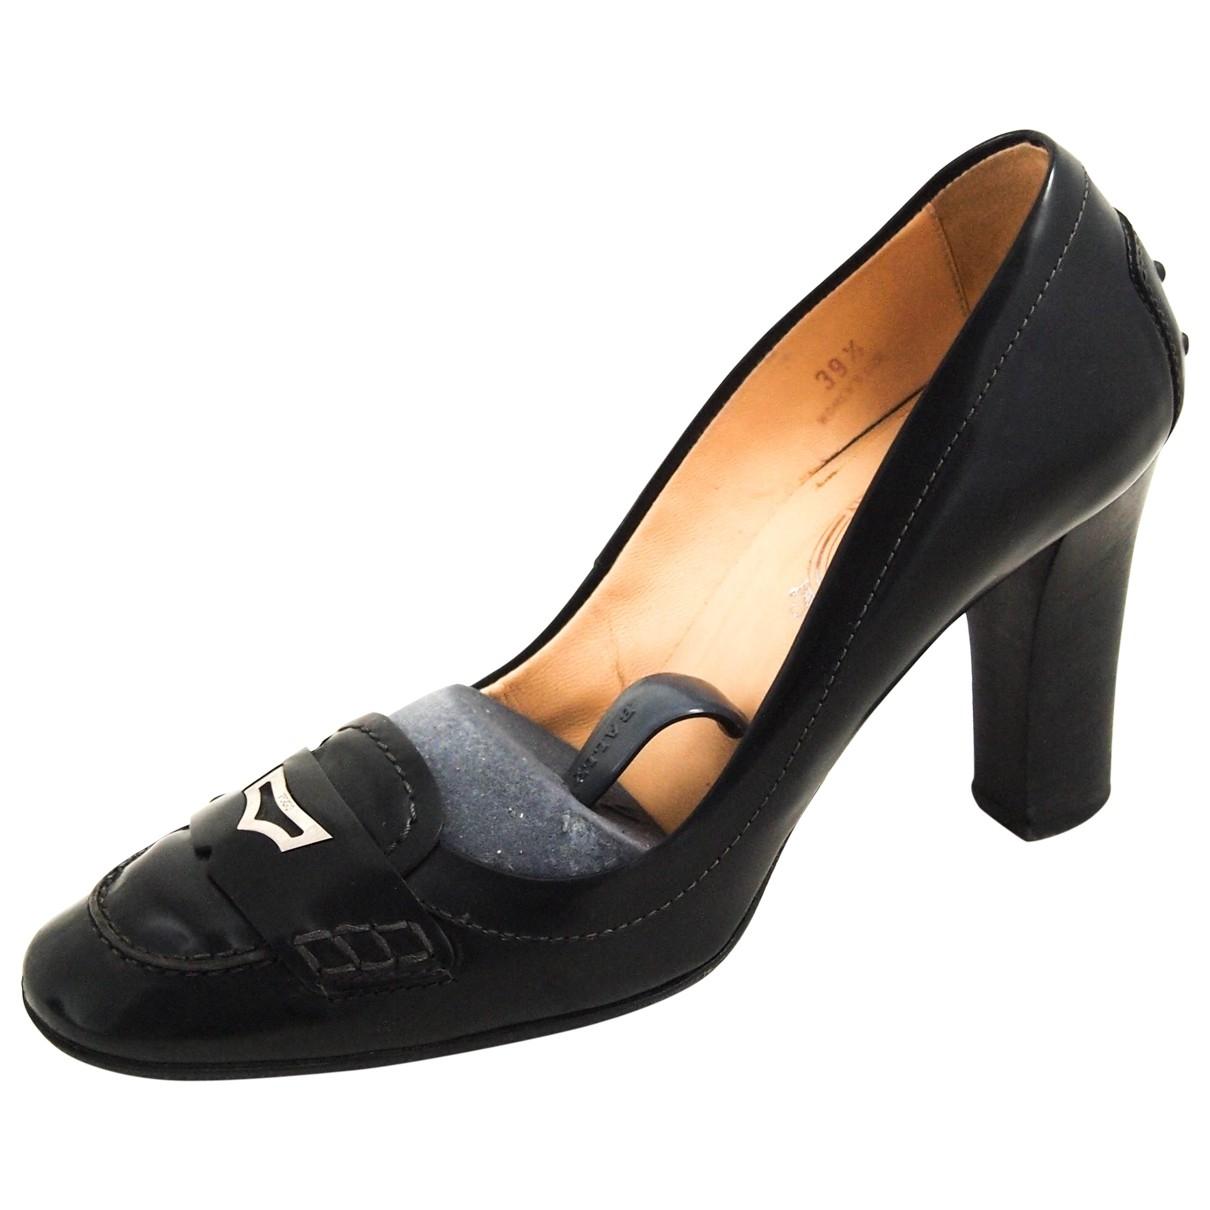 Tod's \N Black Leather Heels for Women 39.5 EU